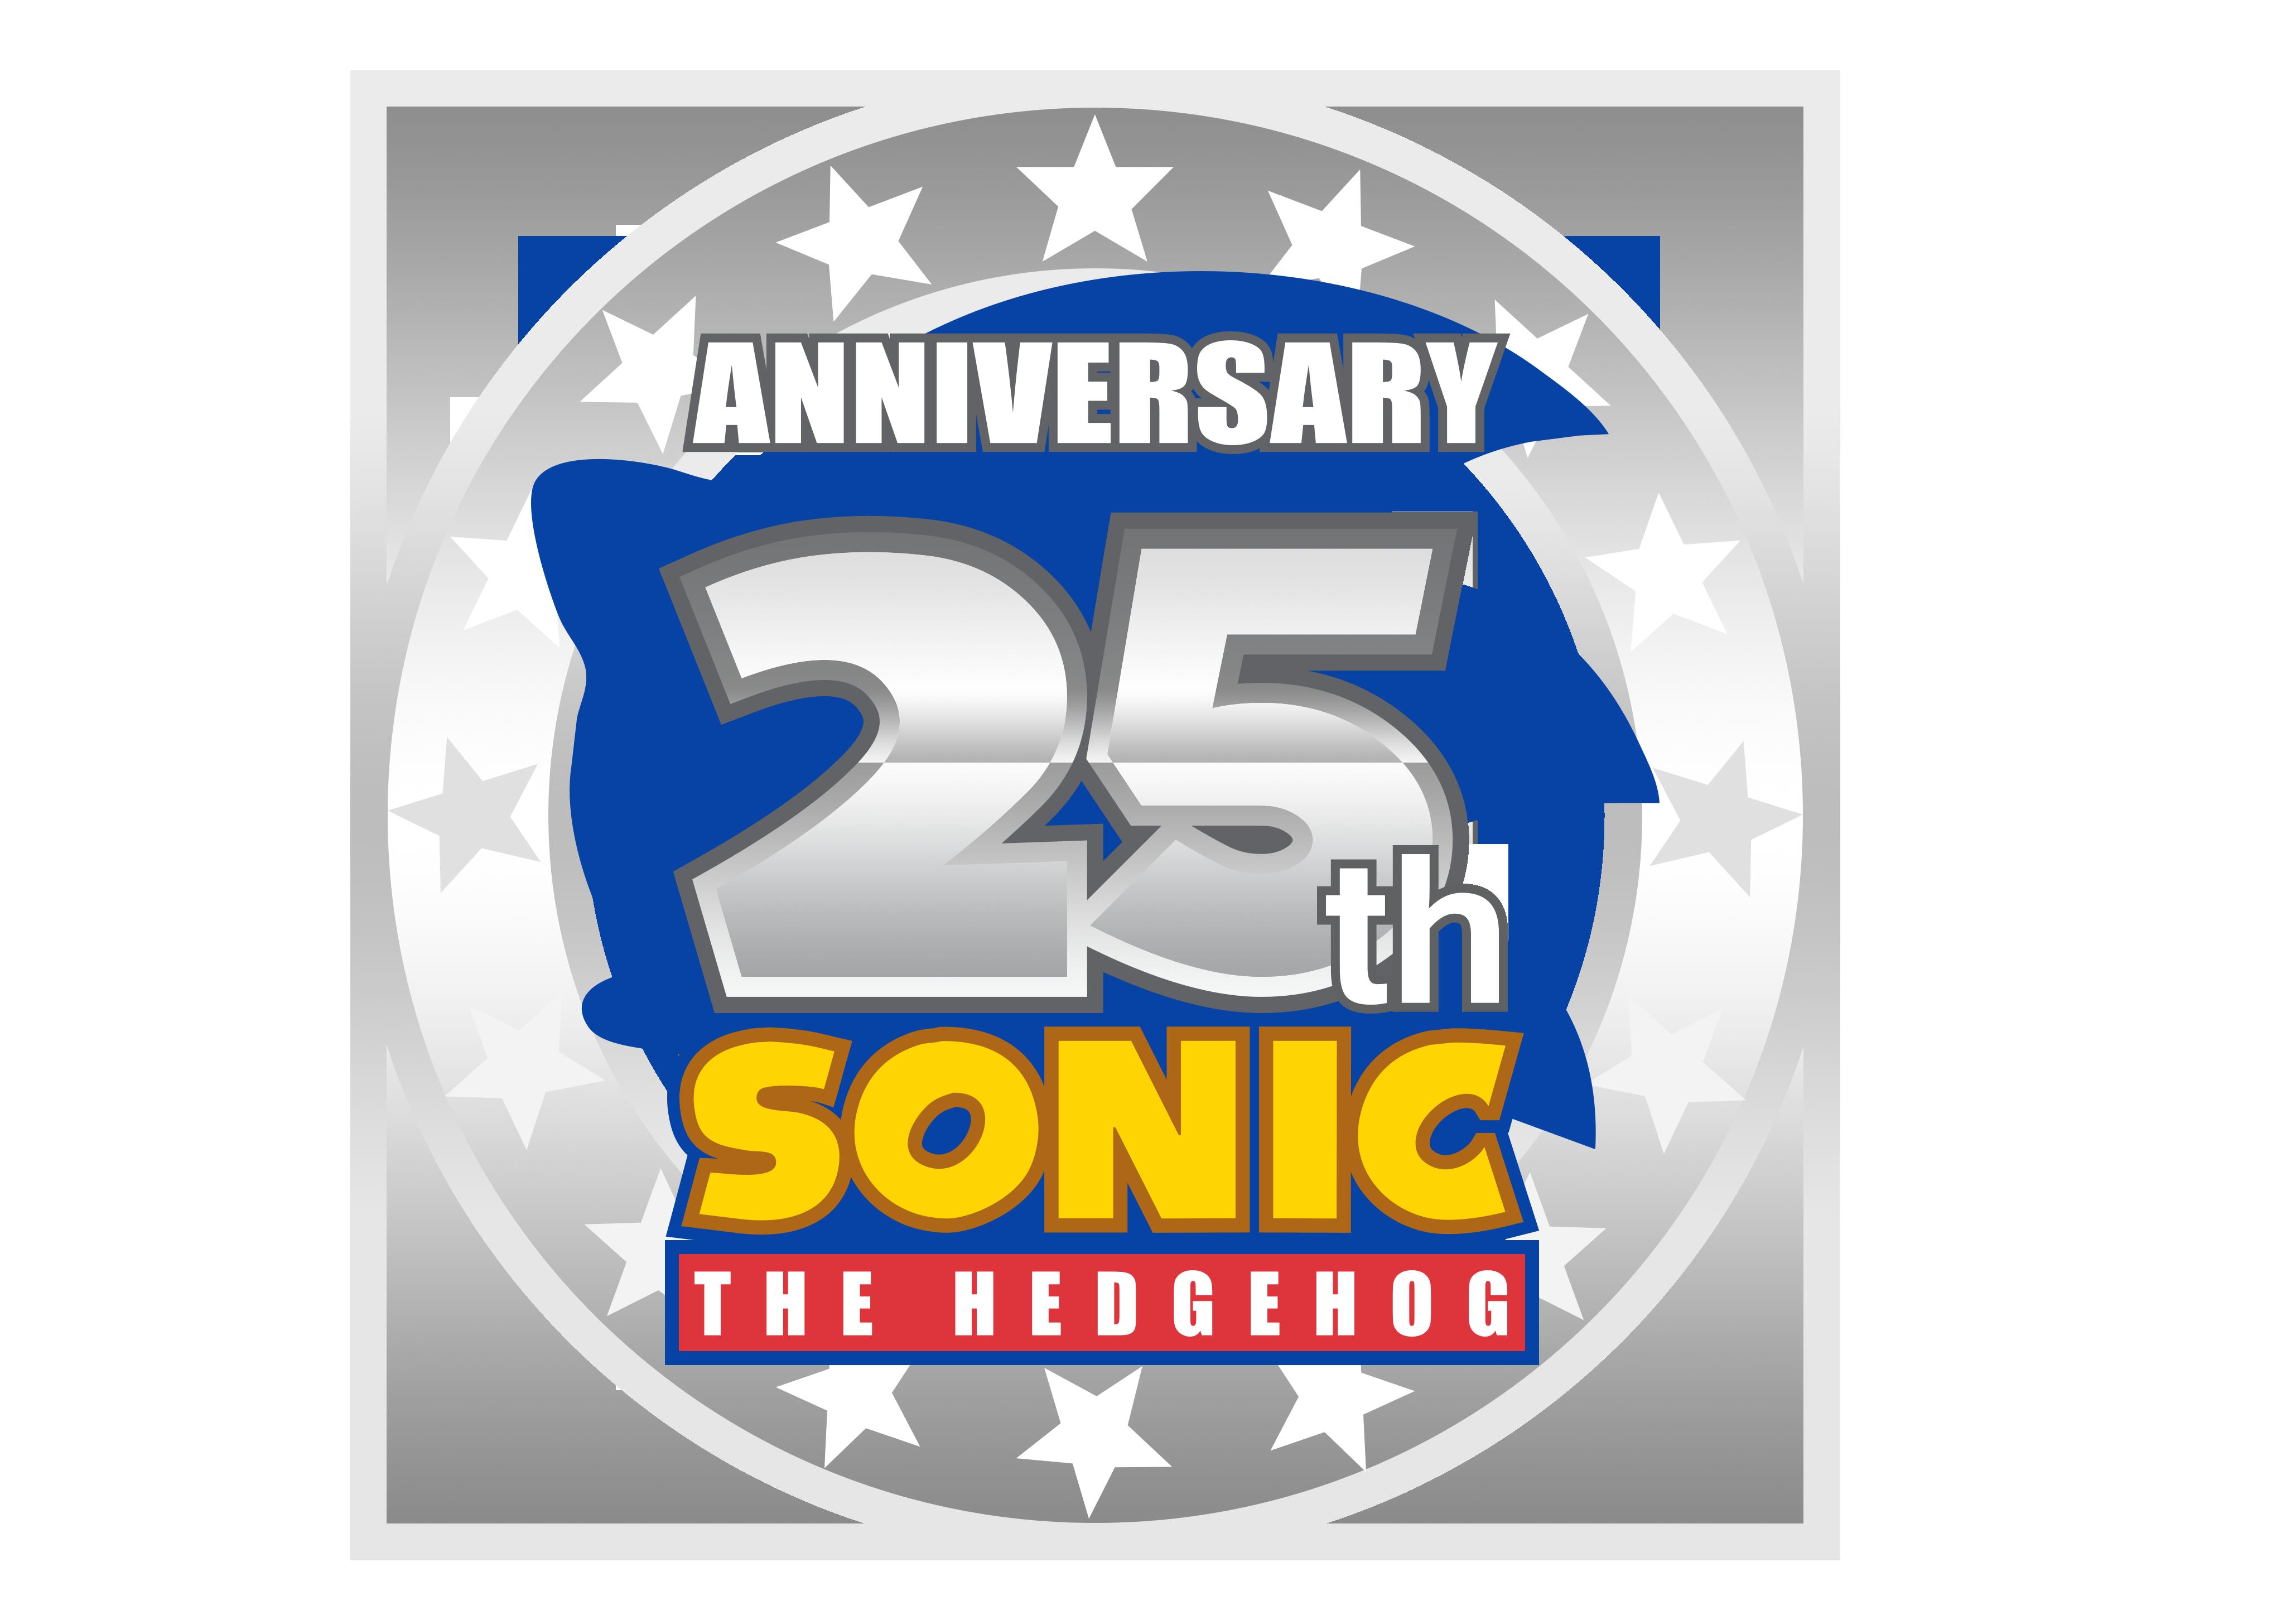 sonic 25th anniversary logo remake by nuryrush on deviantart 25th Anniversary Seal 25th Anniversary Backgrounds